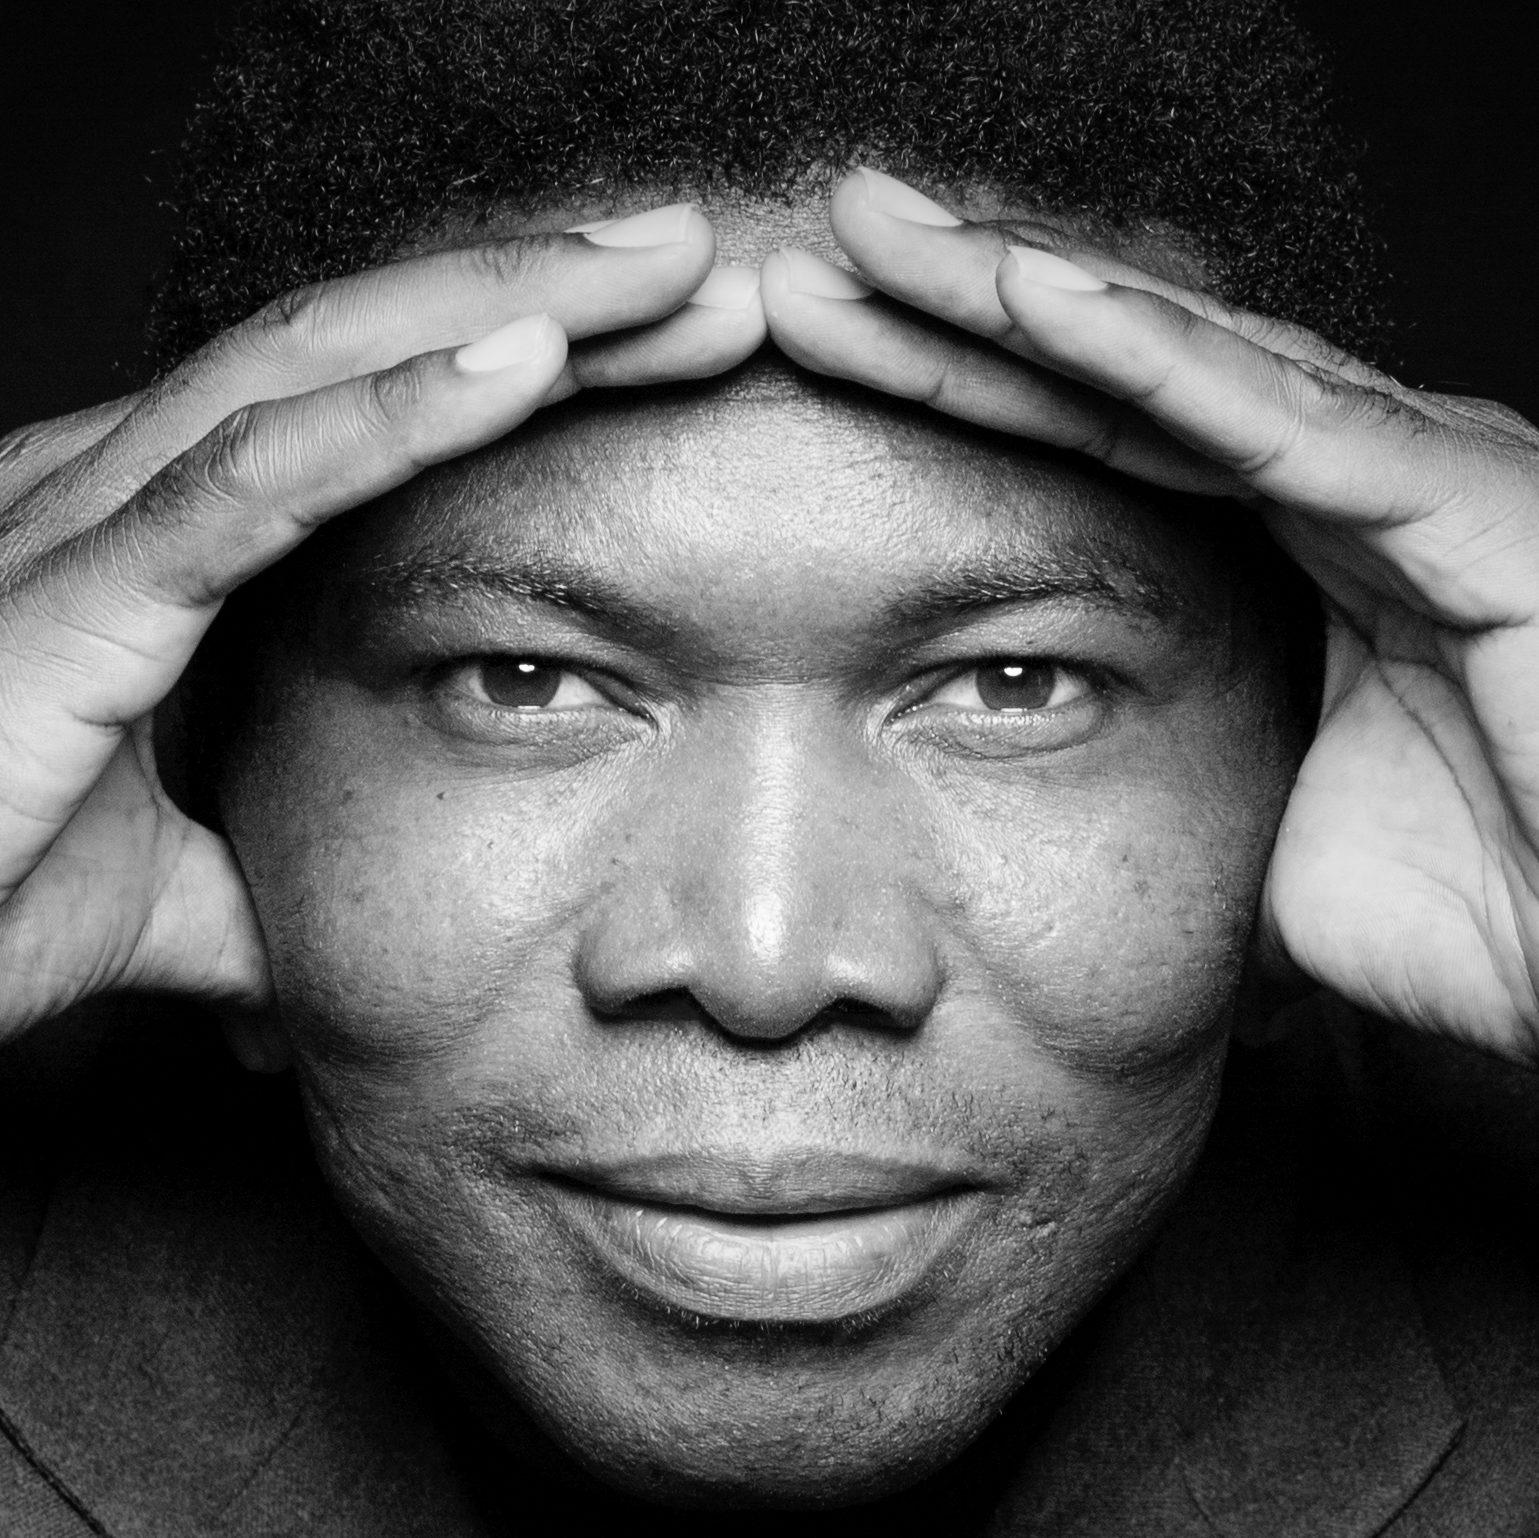 Etienne Minoungou (actor)